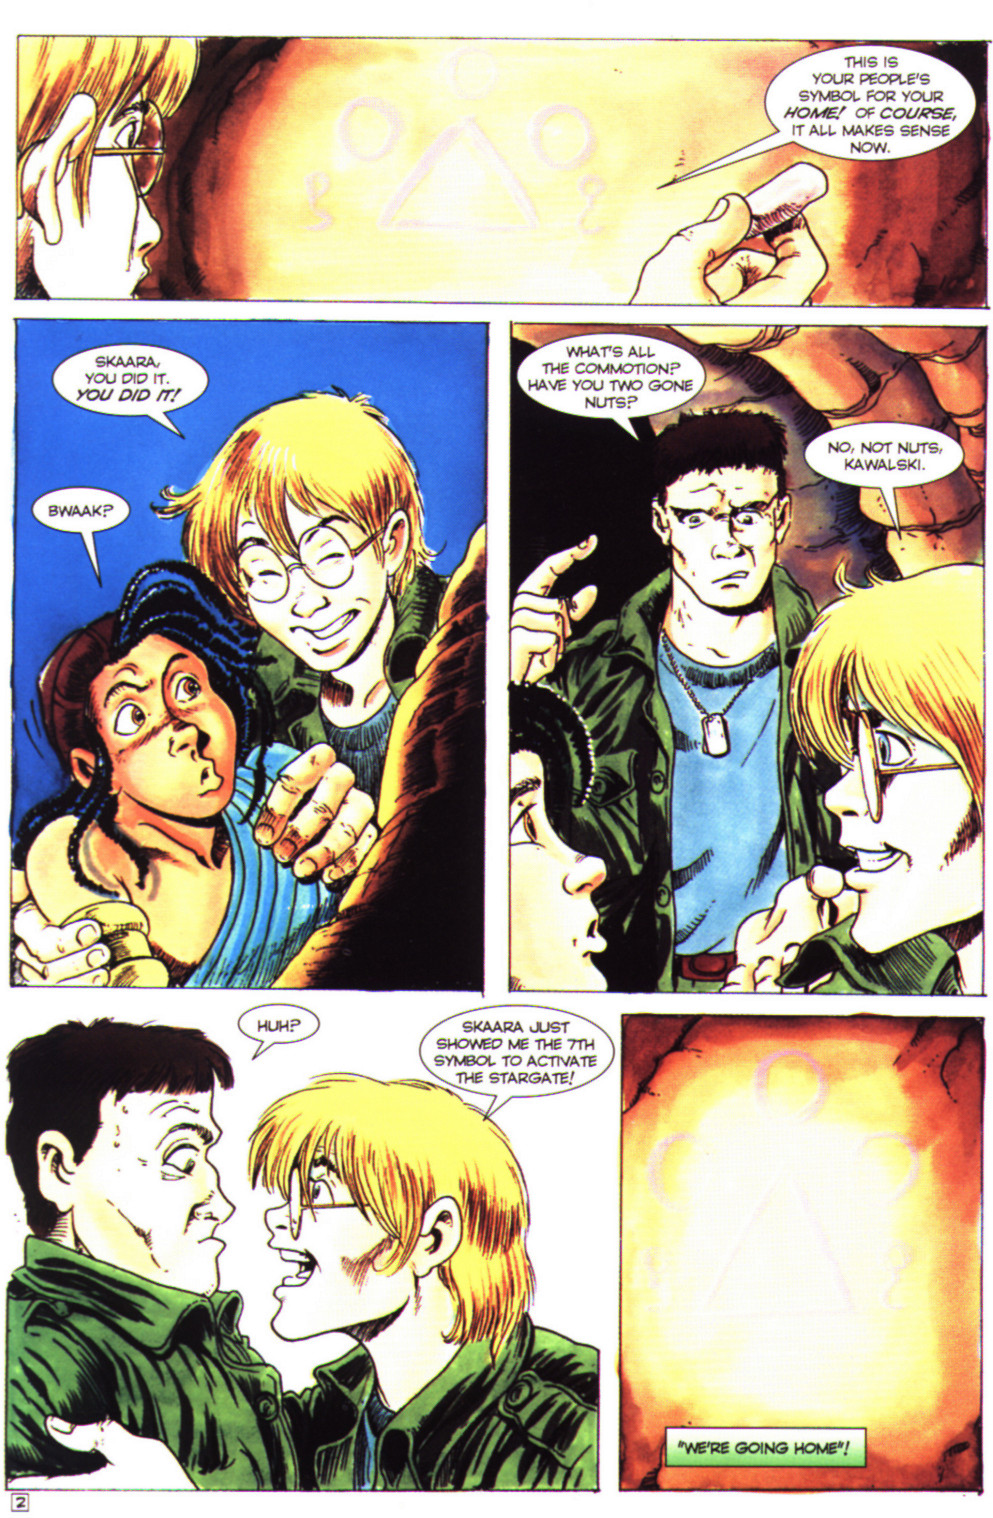 Read online Stargate comic -  Issue #4 - 4